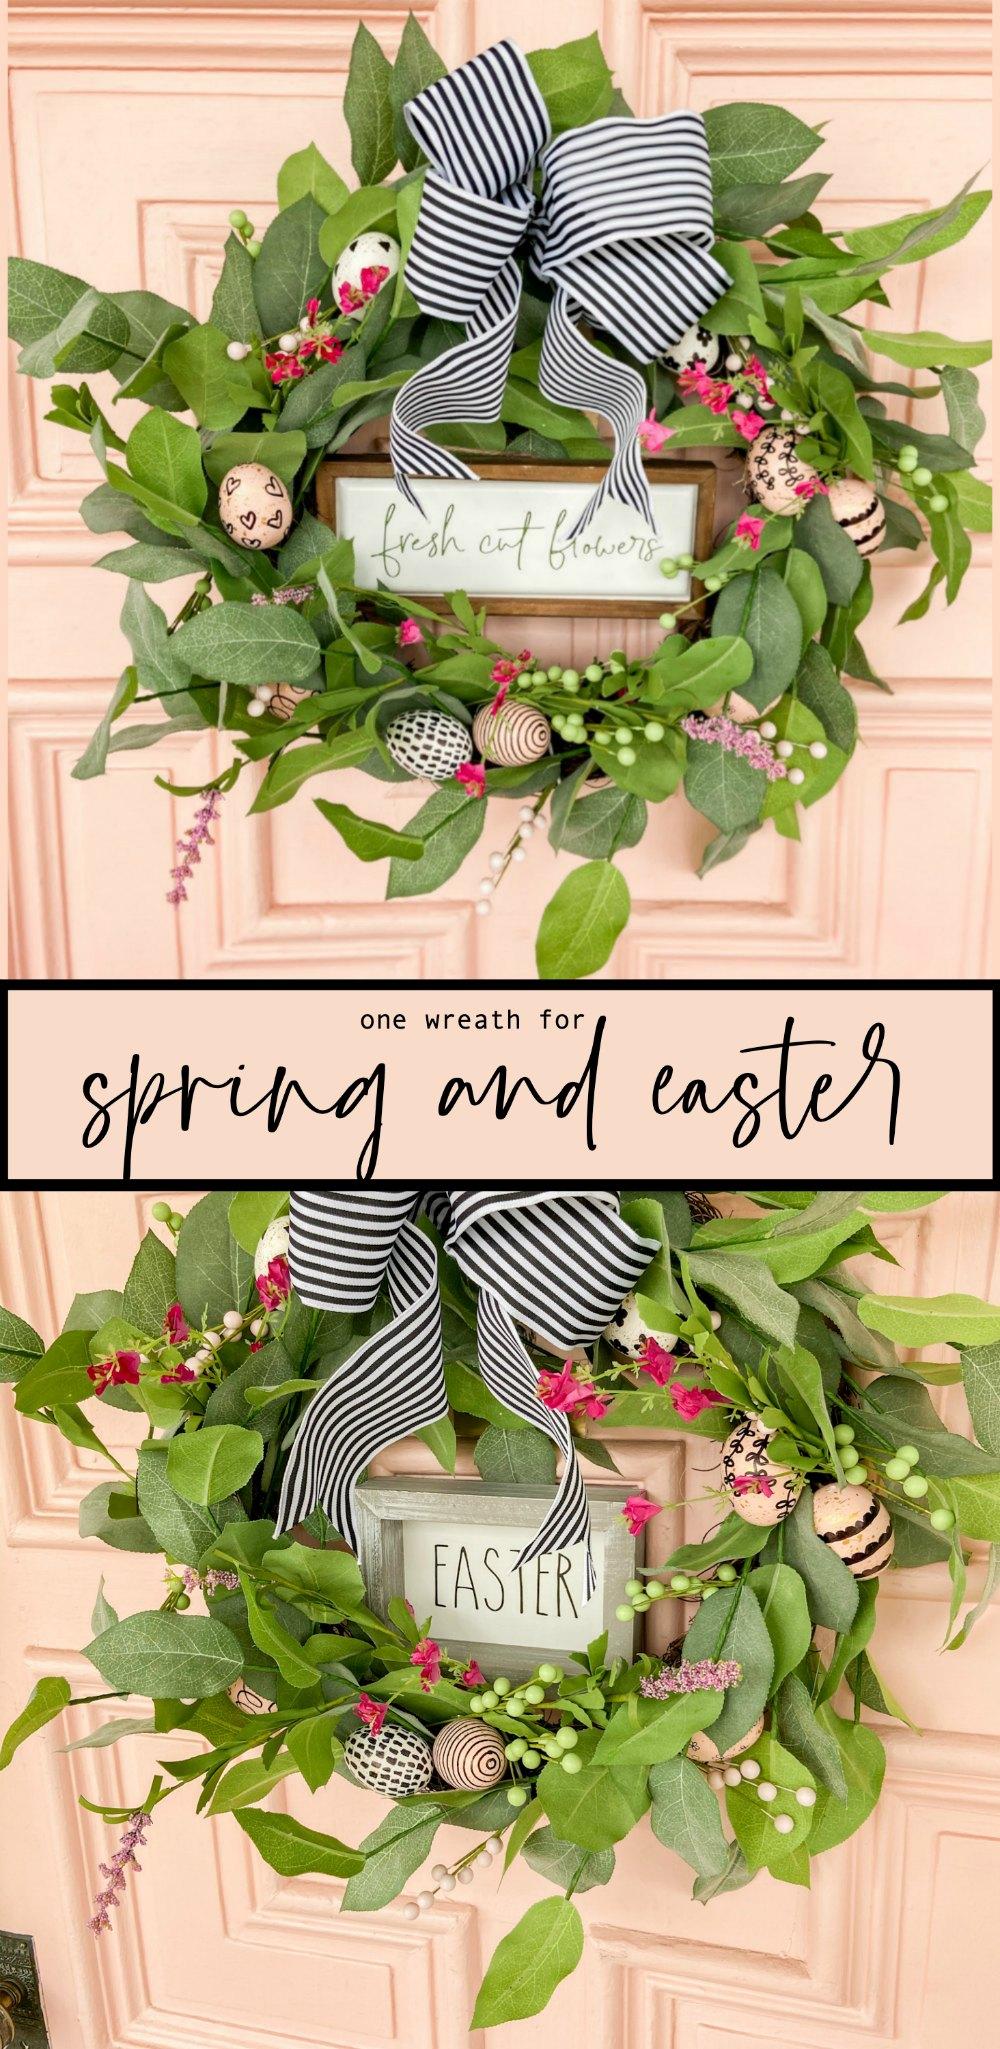 Farmhouse Spring Sharpie Egg Wreath. Create a vibrant Spring Wreath with sharpie eggs for a black and white farmhouse take on Spring!